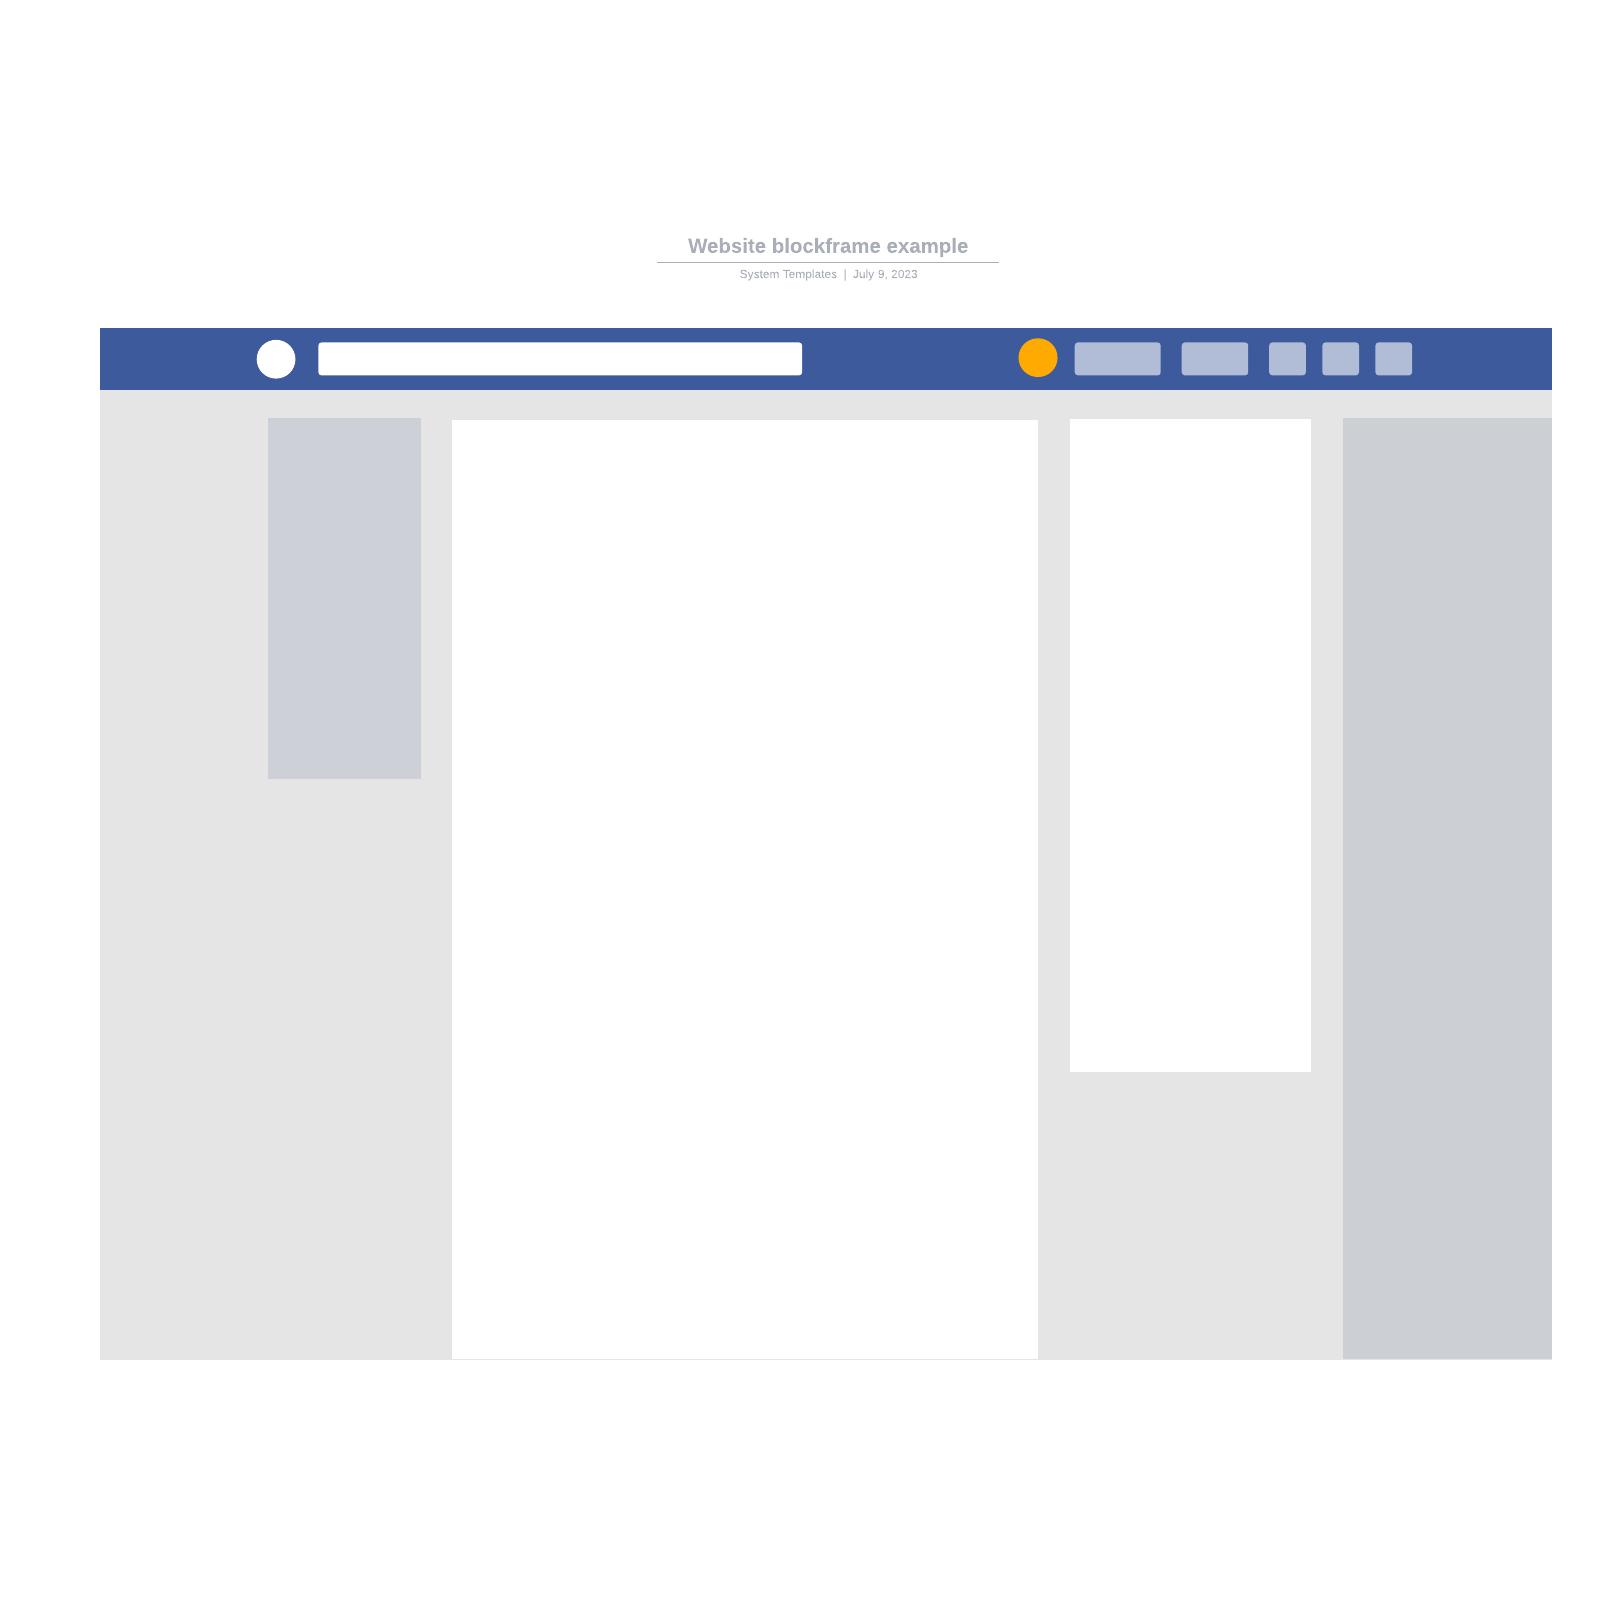 Website blockframe example